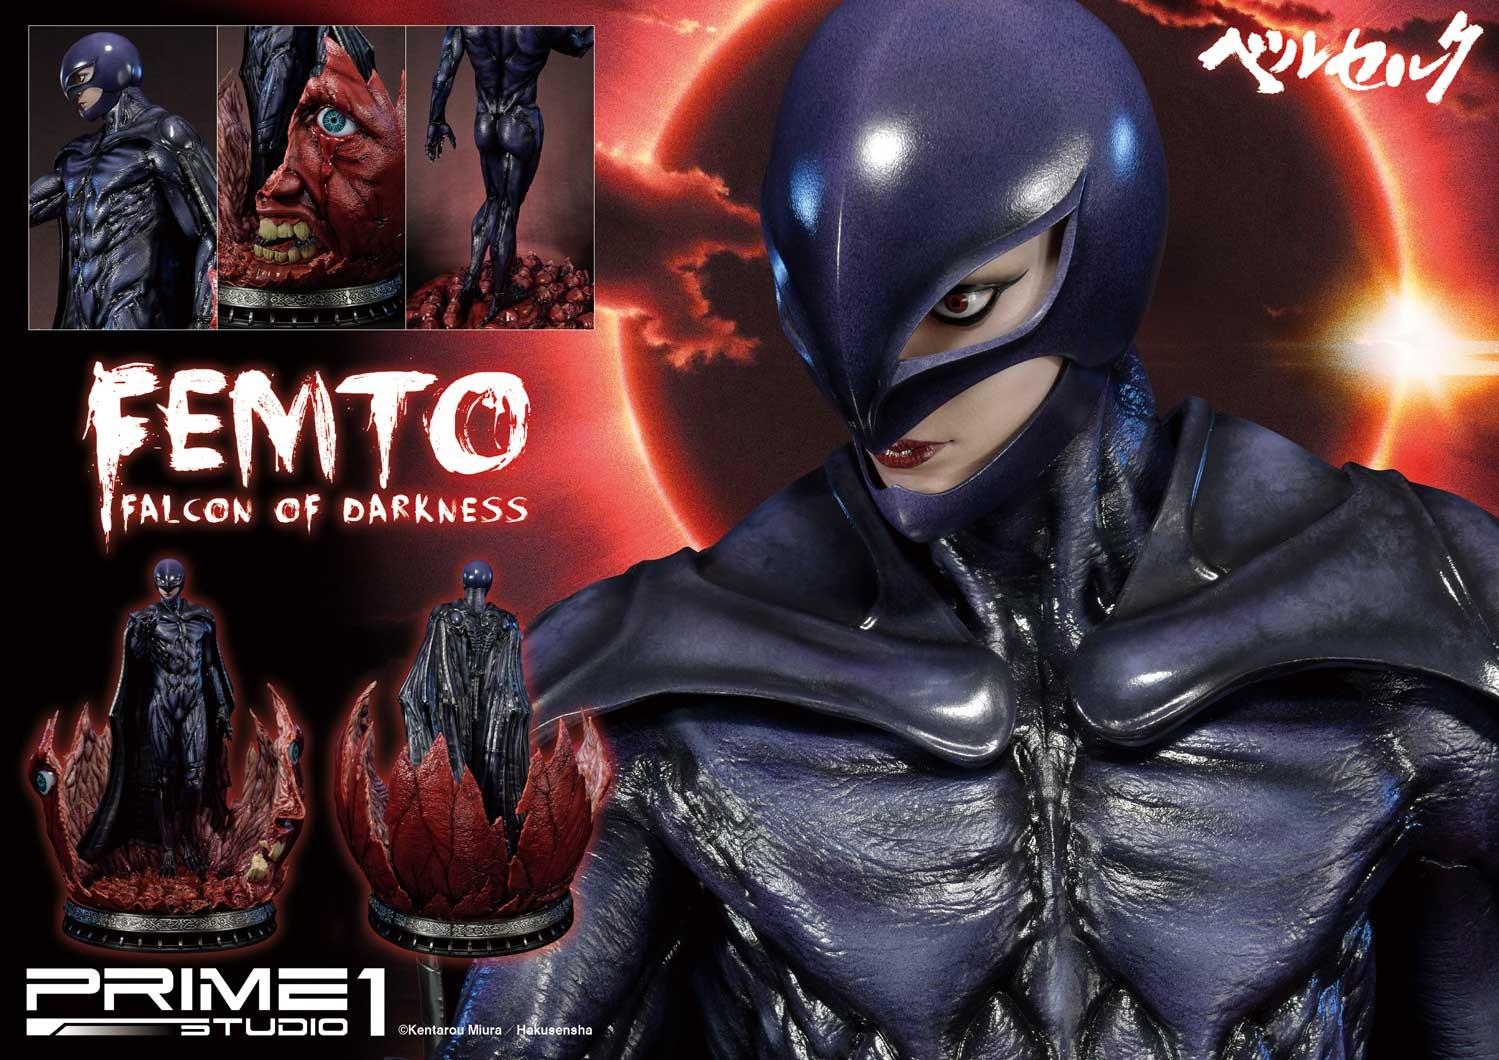 Link a Berserk Femto Falcon of Darkness Ultimate Premium Masterline Prime 1 Studio Itakon.it 31